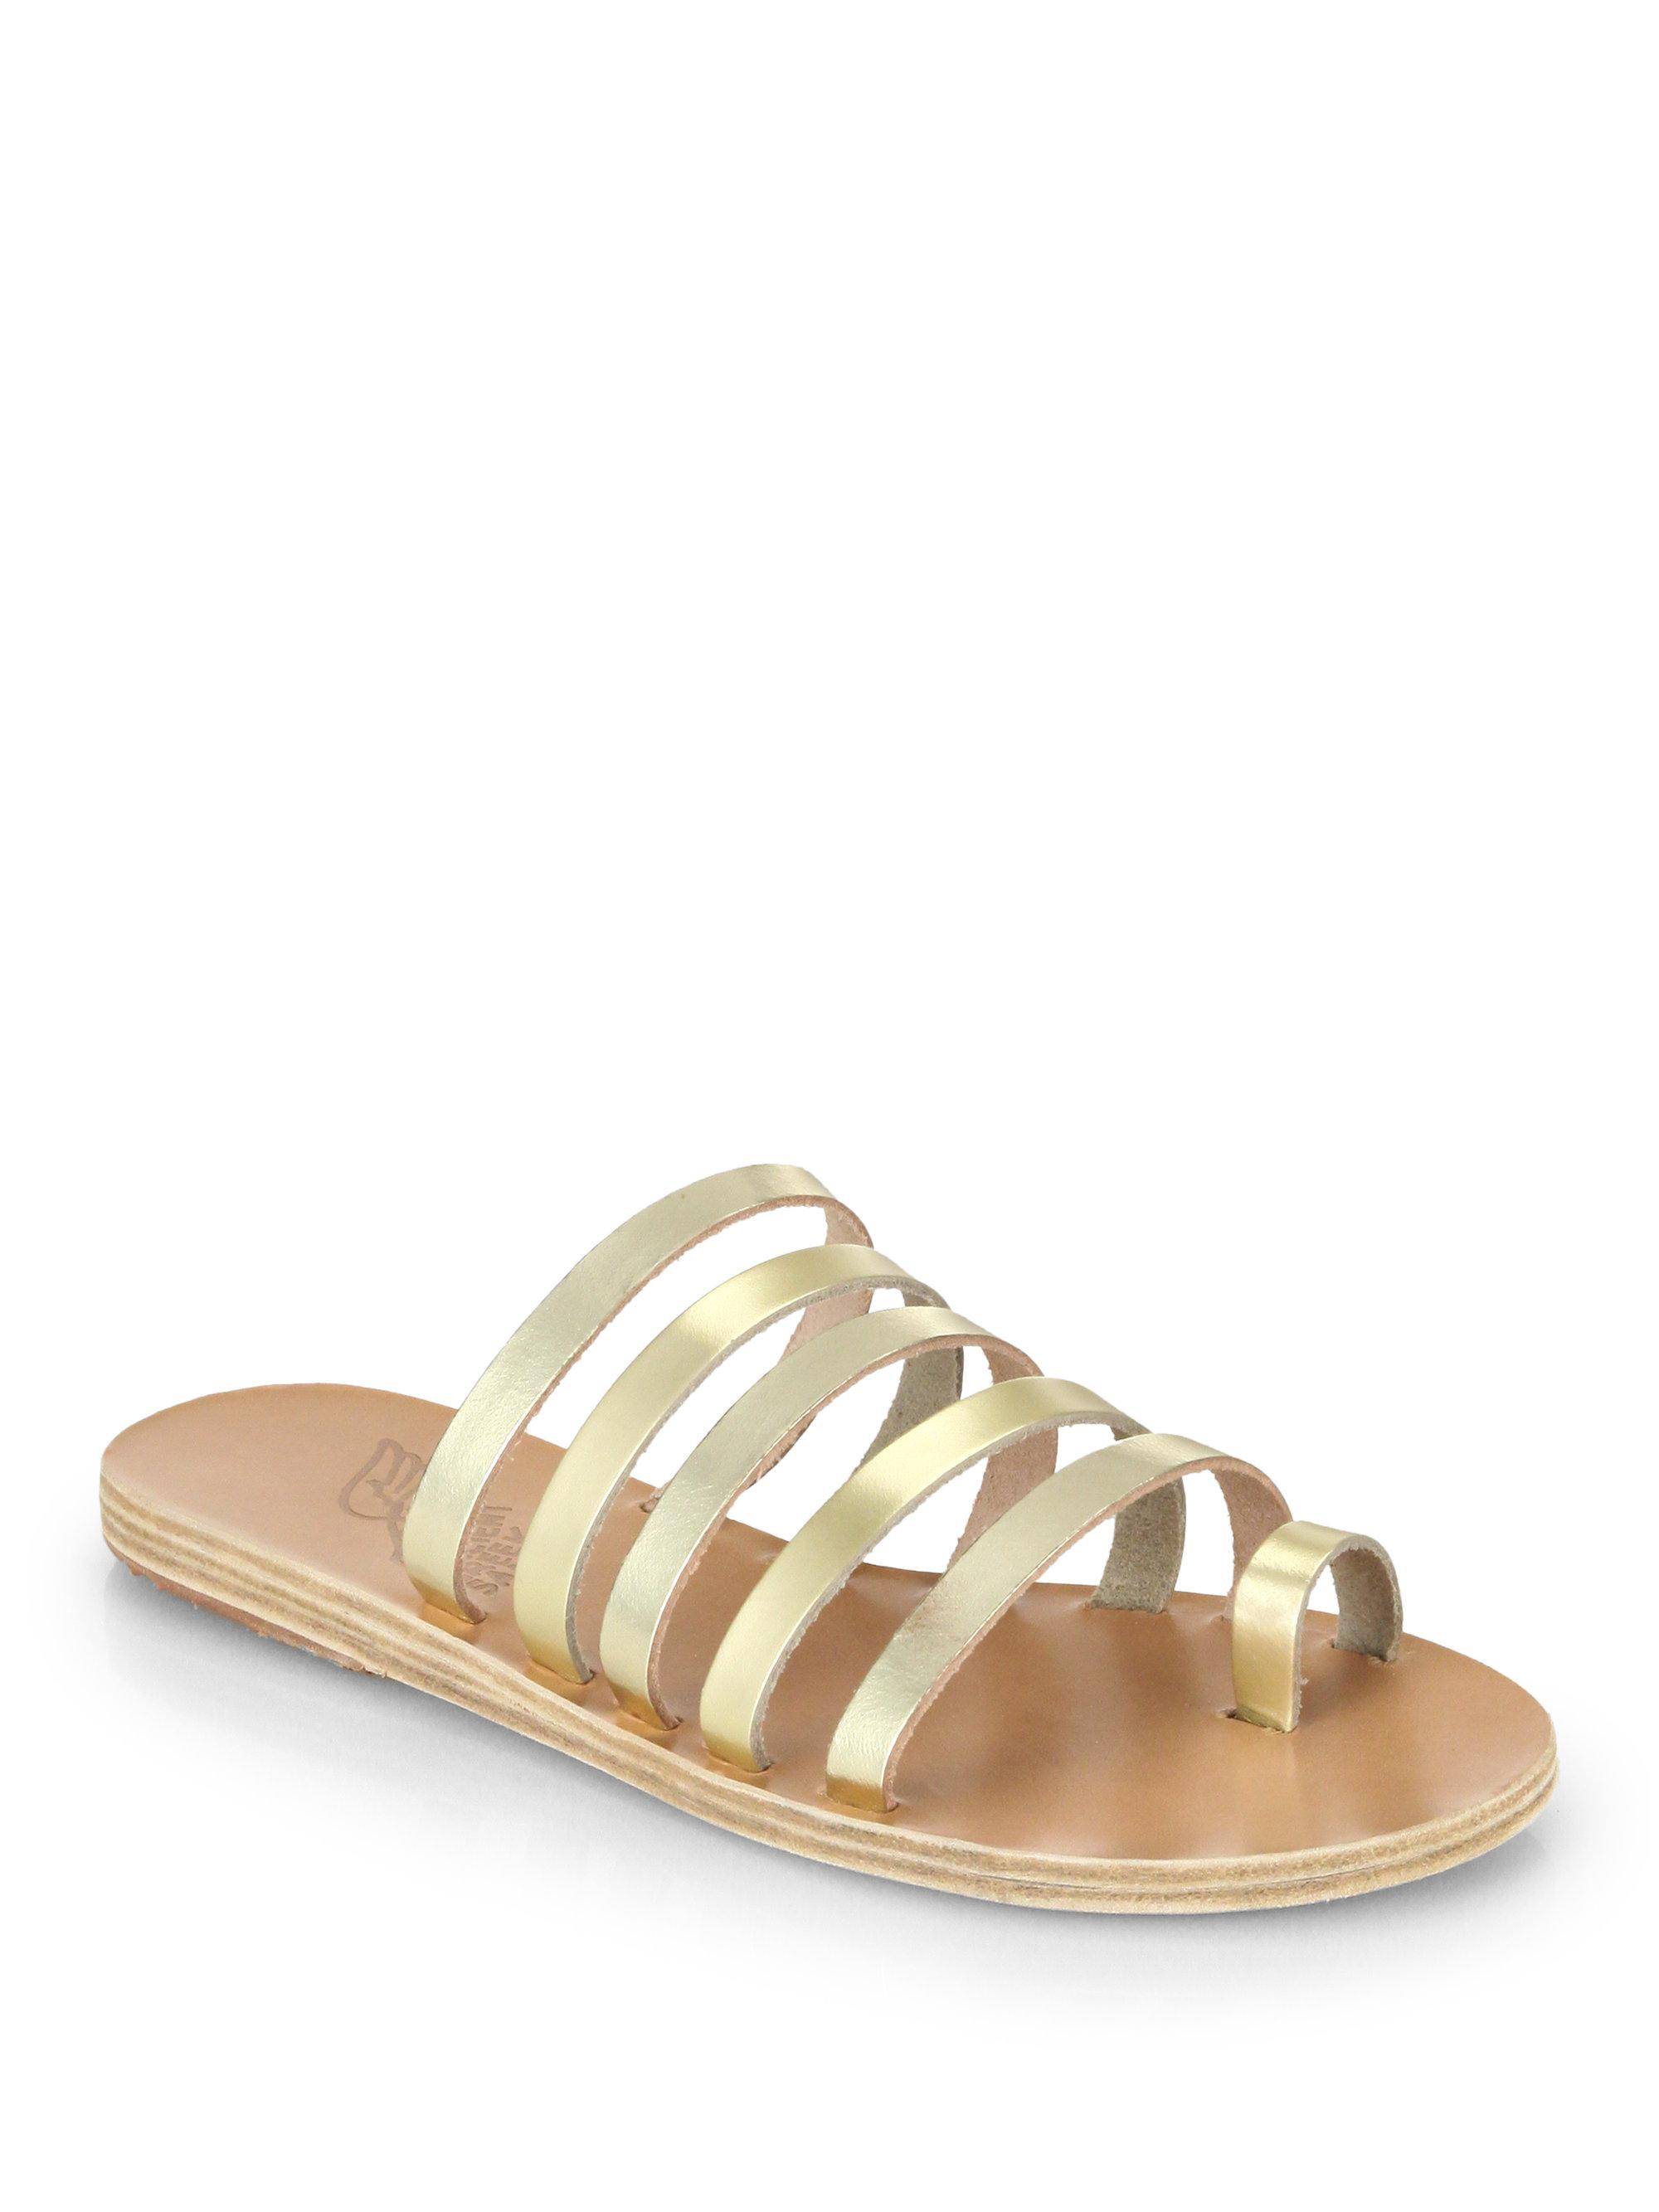 Niki Metallic Leather Sandals - Gold Ancient Greek Sandals Discount Visit Best Cheap Price Discount 2018 Unisex Discount Amazon Free Shipping Sneakernews E4vW4m